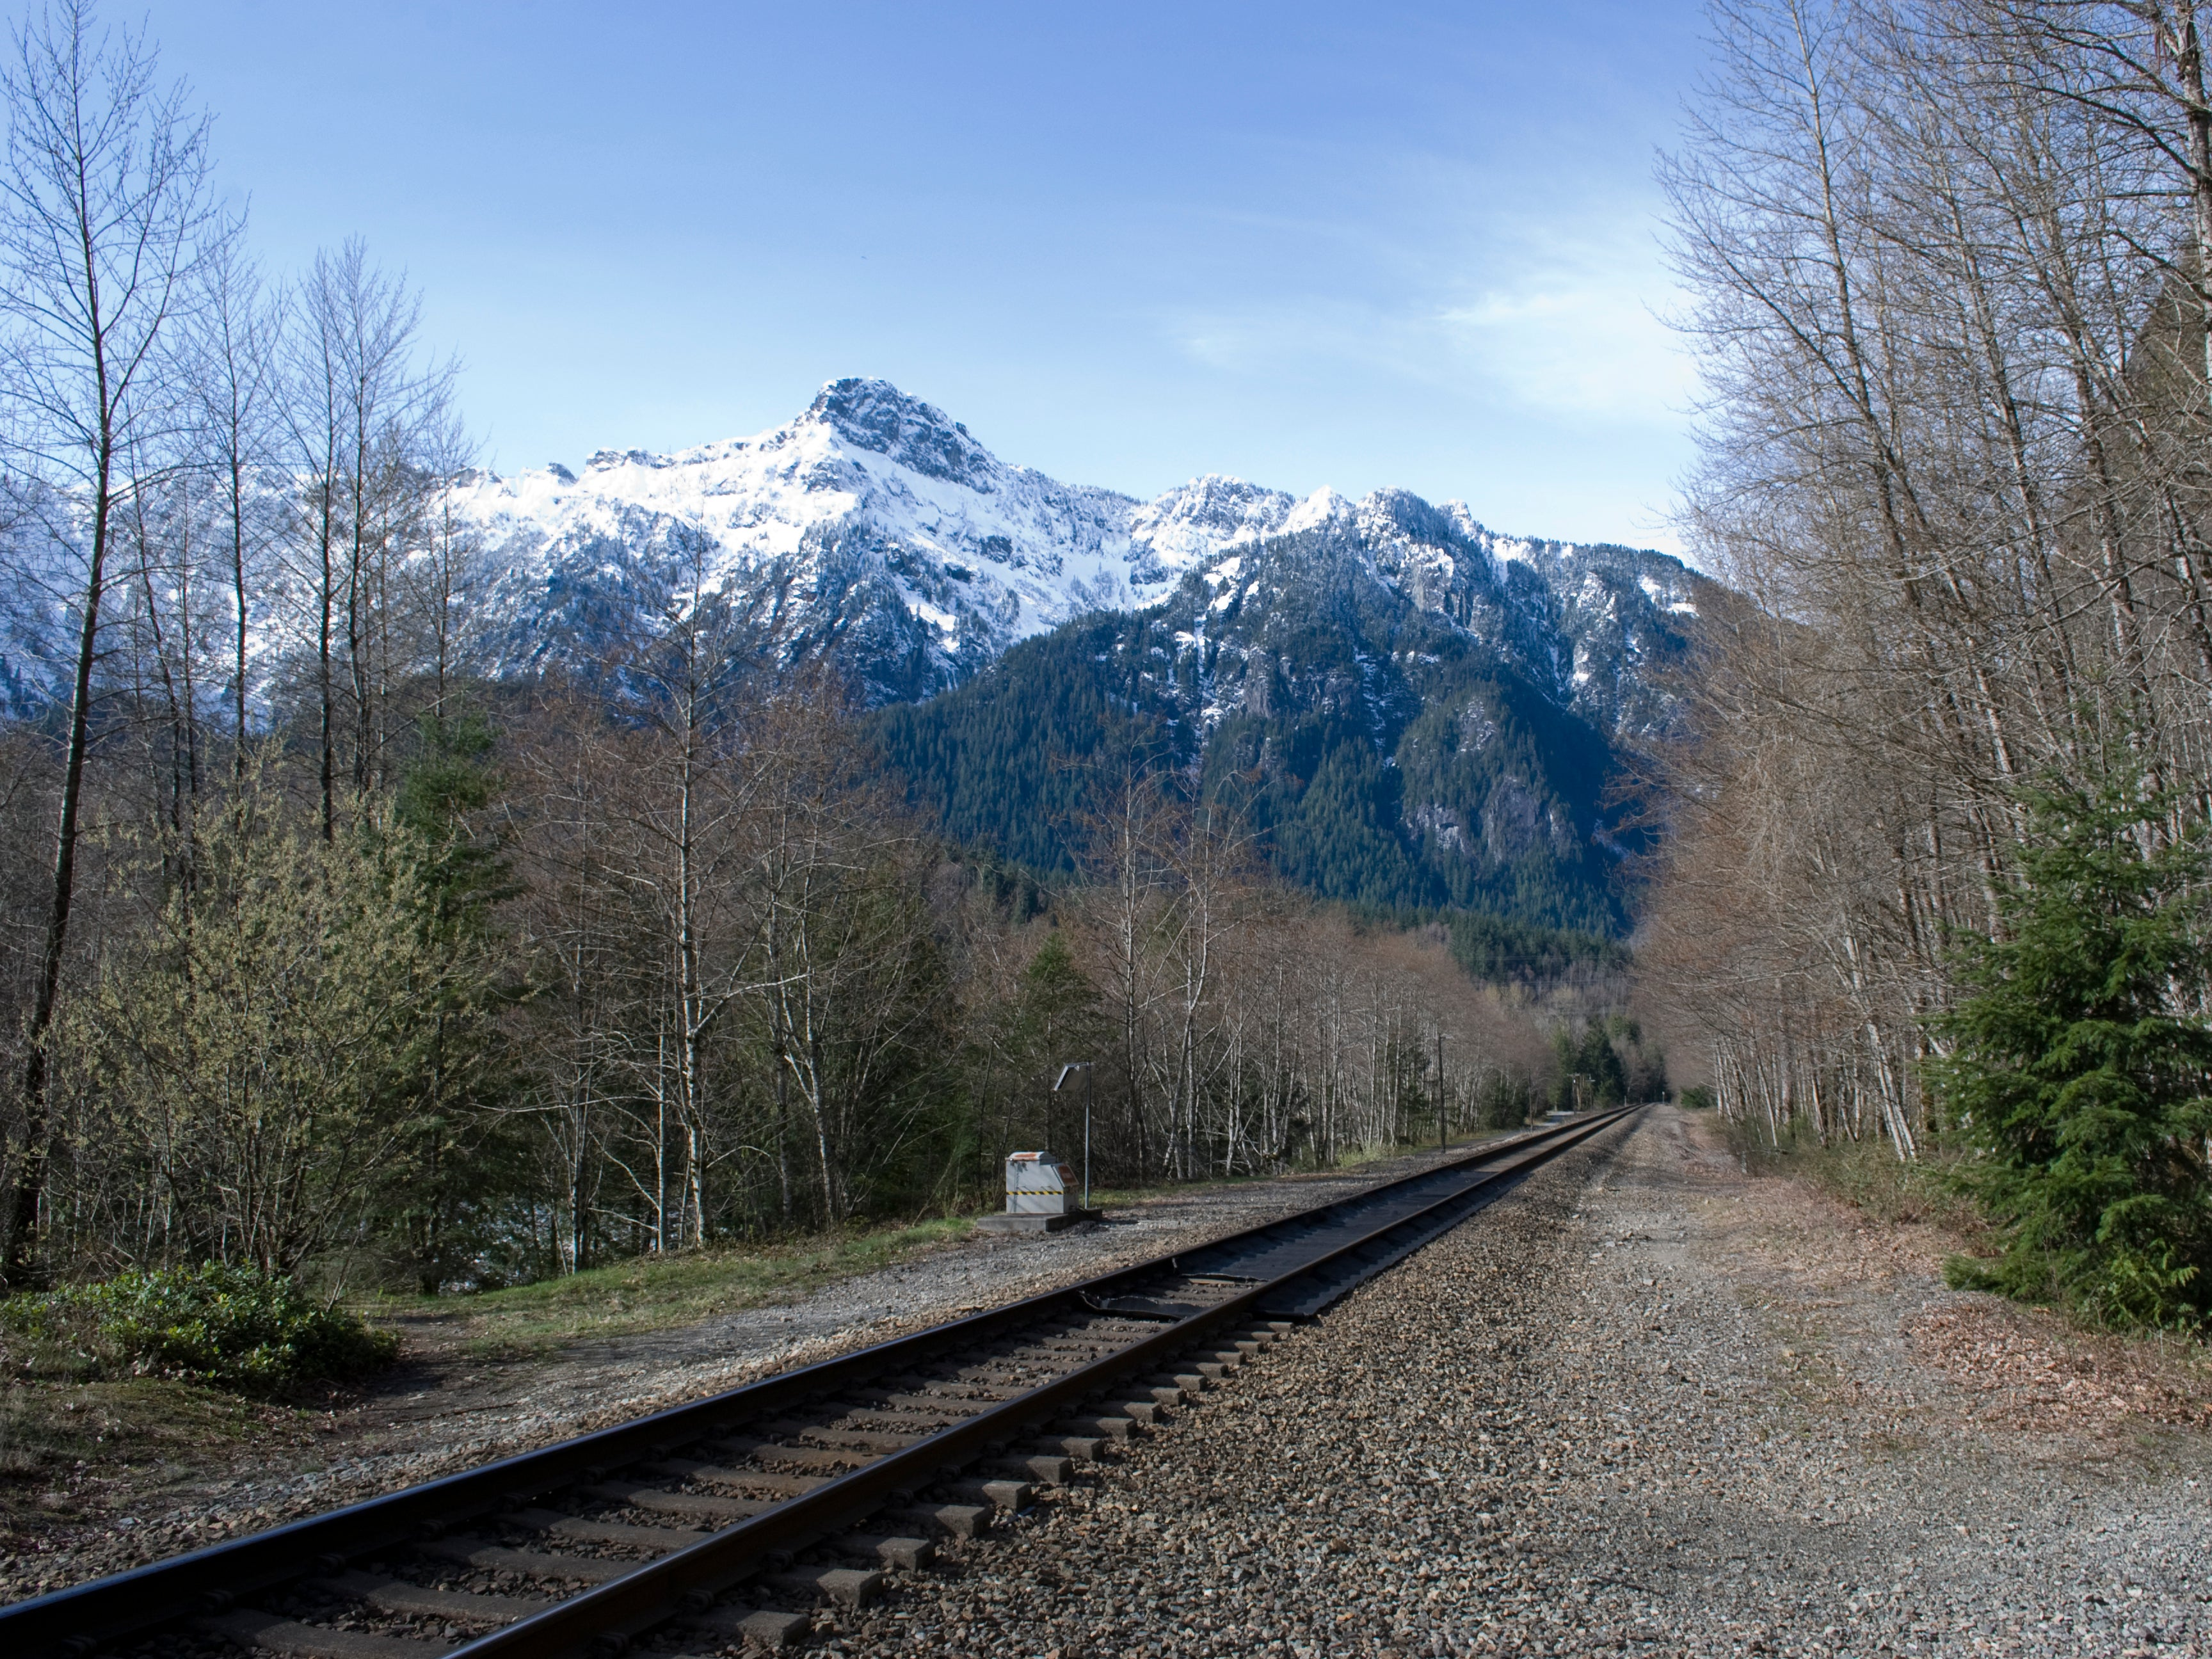 Wildest hikes Paradise, Mt. Rainier, WA